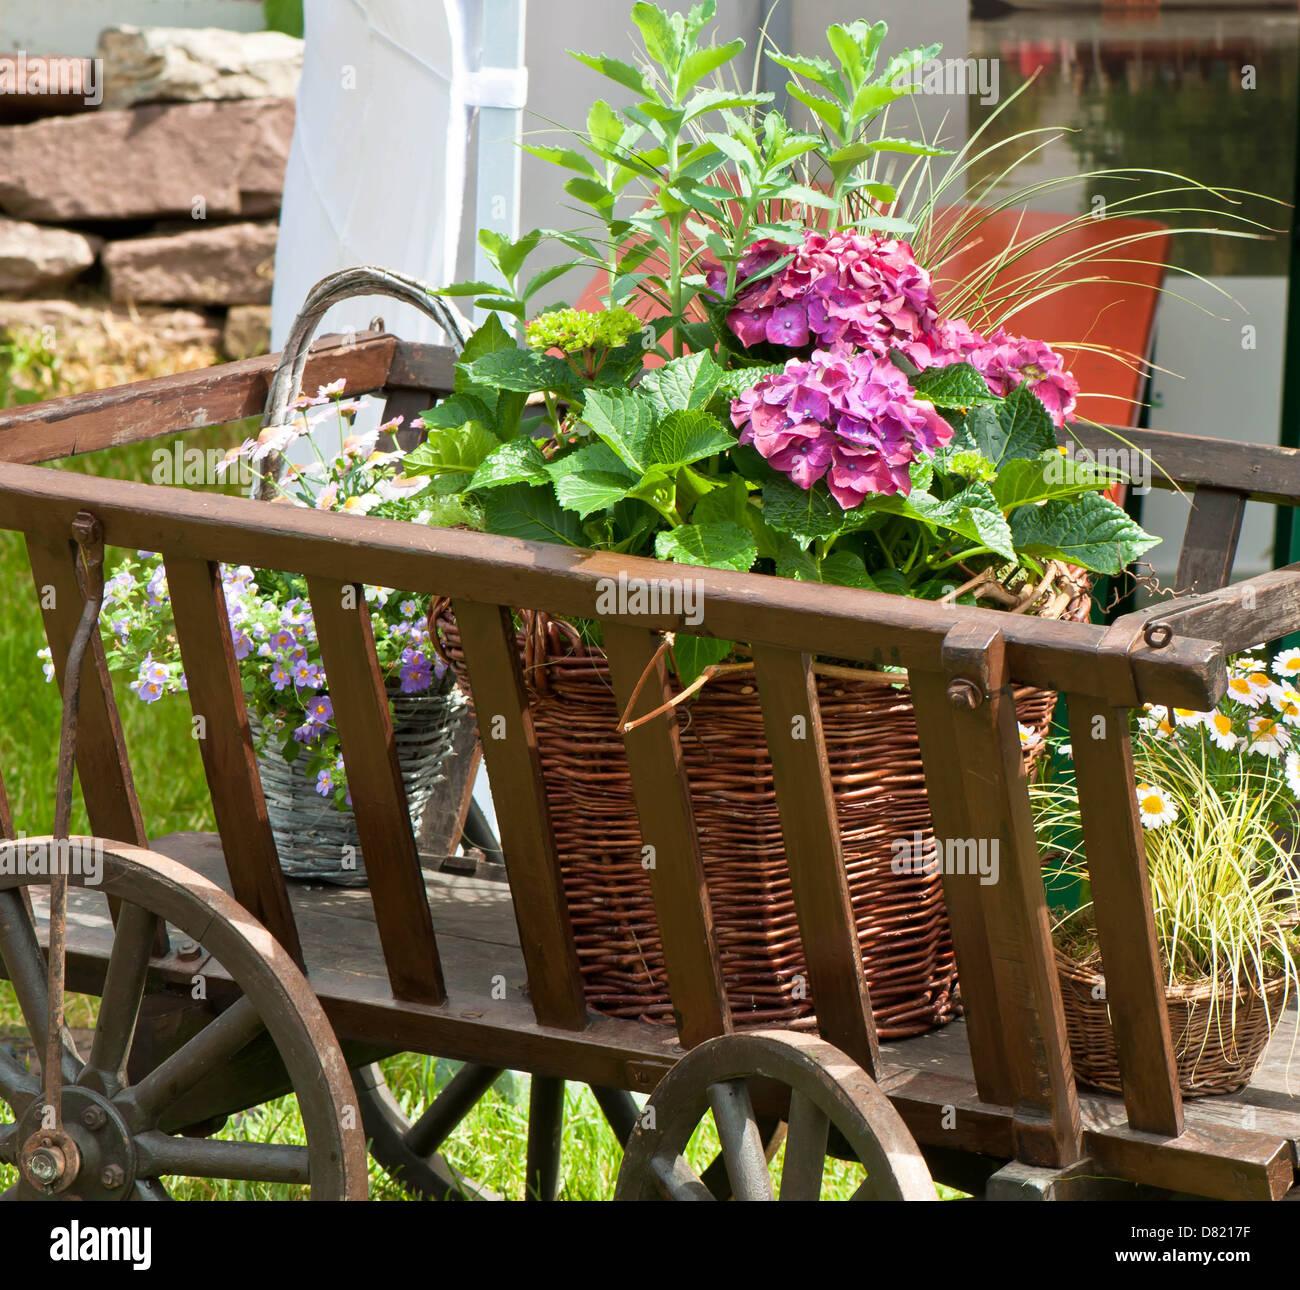 Wheel, Spoke, Summer, Plant, Basket, Multi Colored, Flower Pot - Stock Image